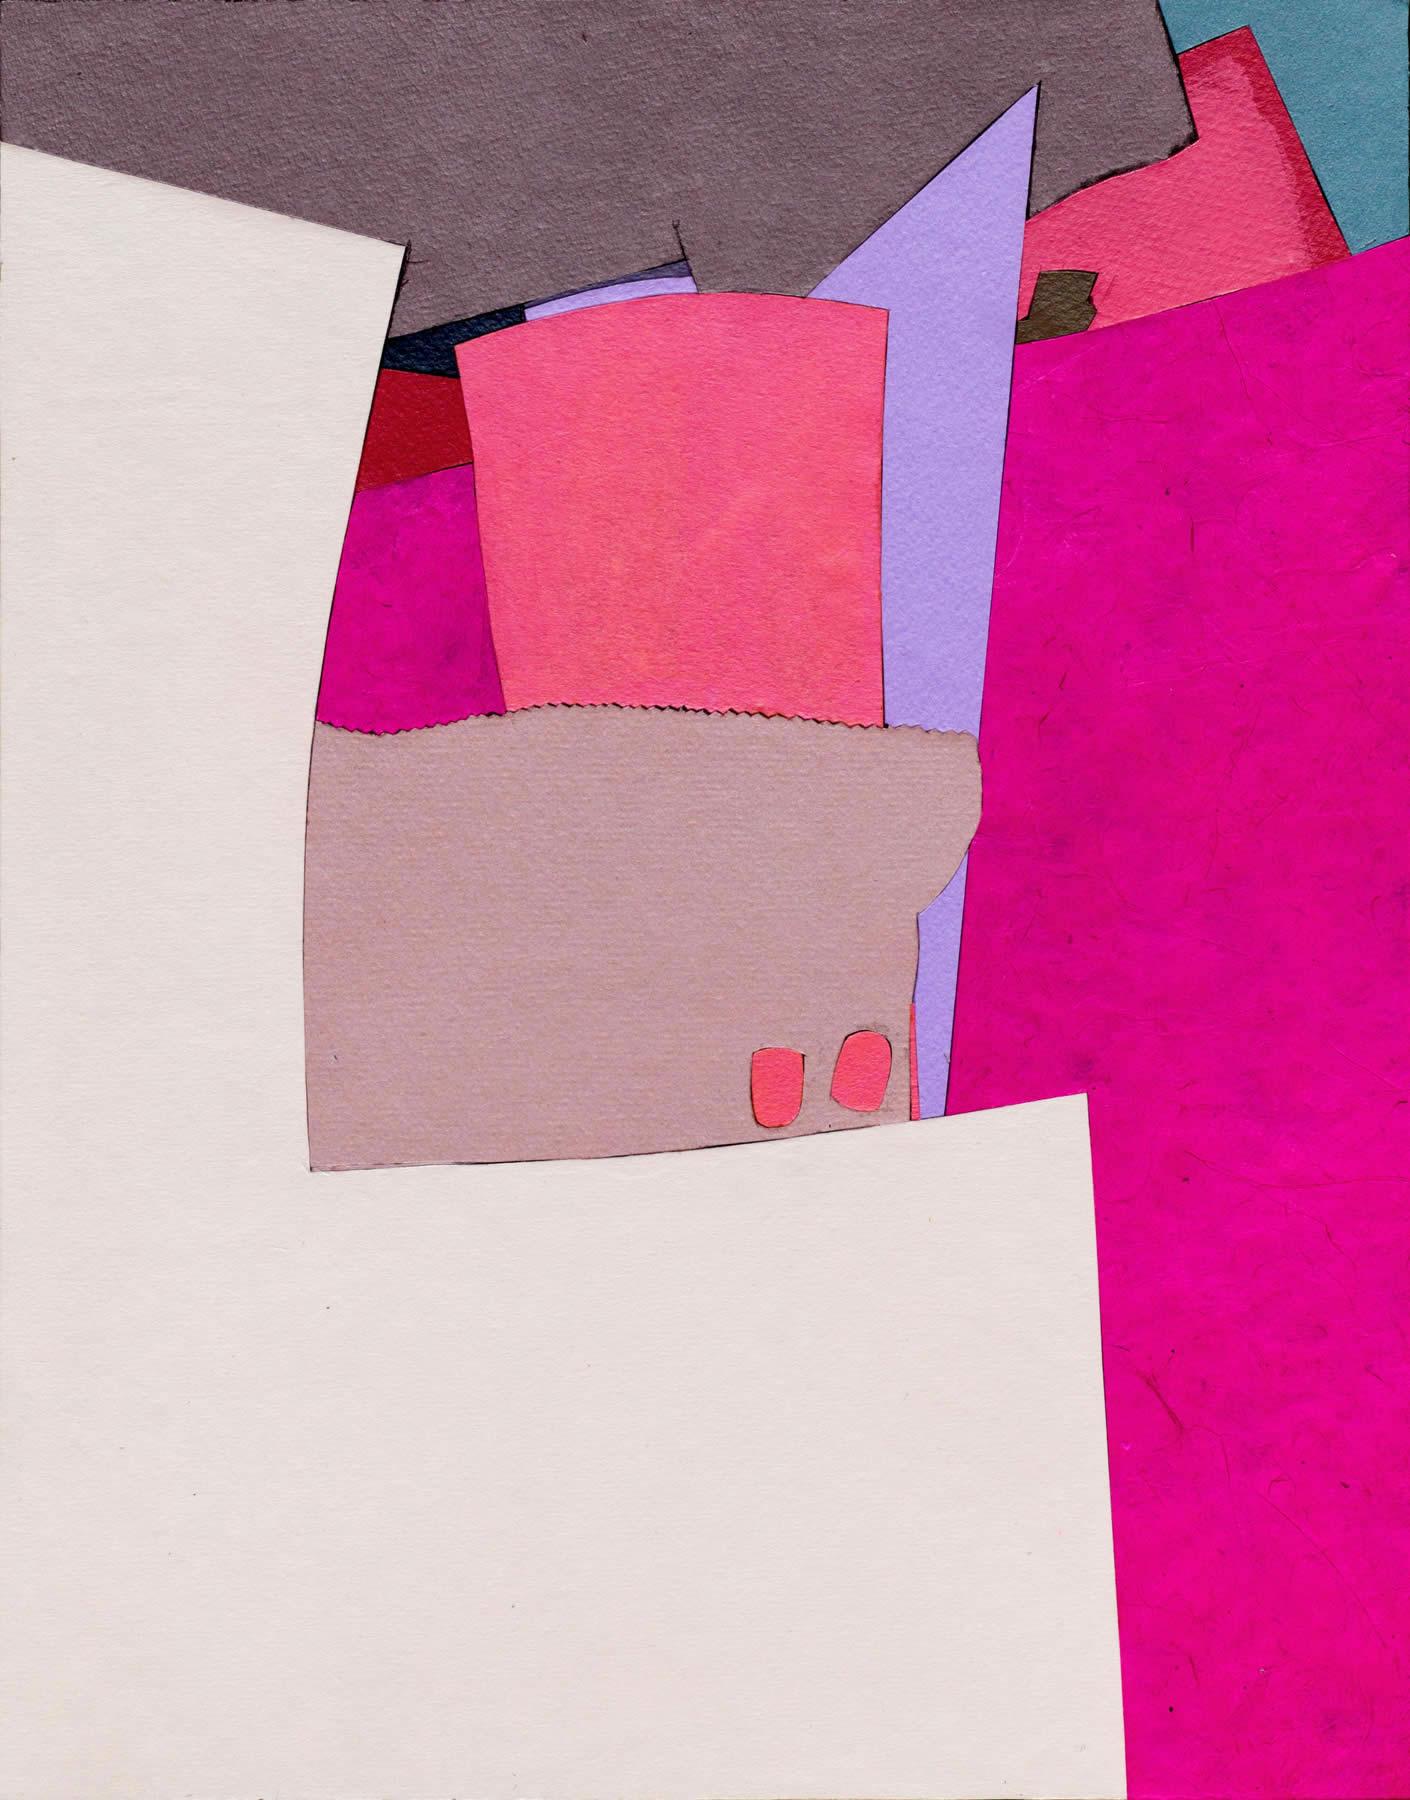 Pile 3 (Pinks)